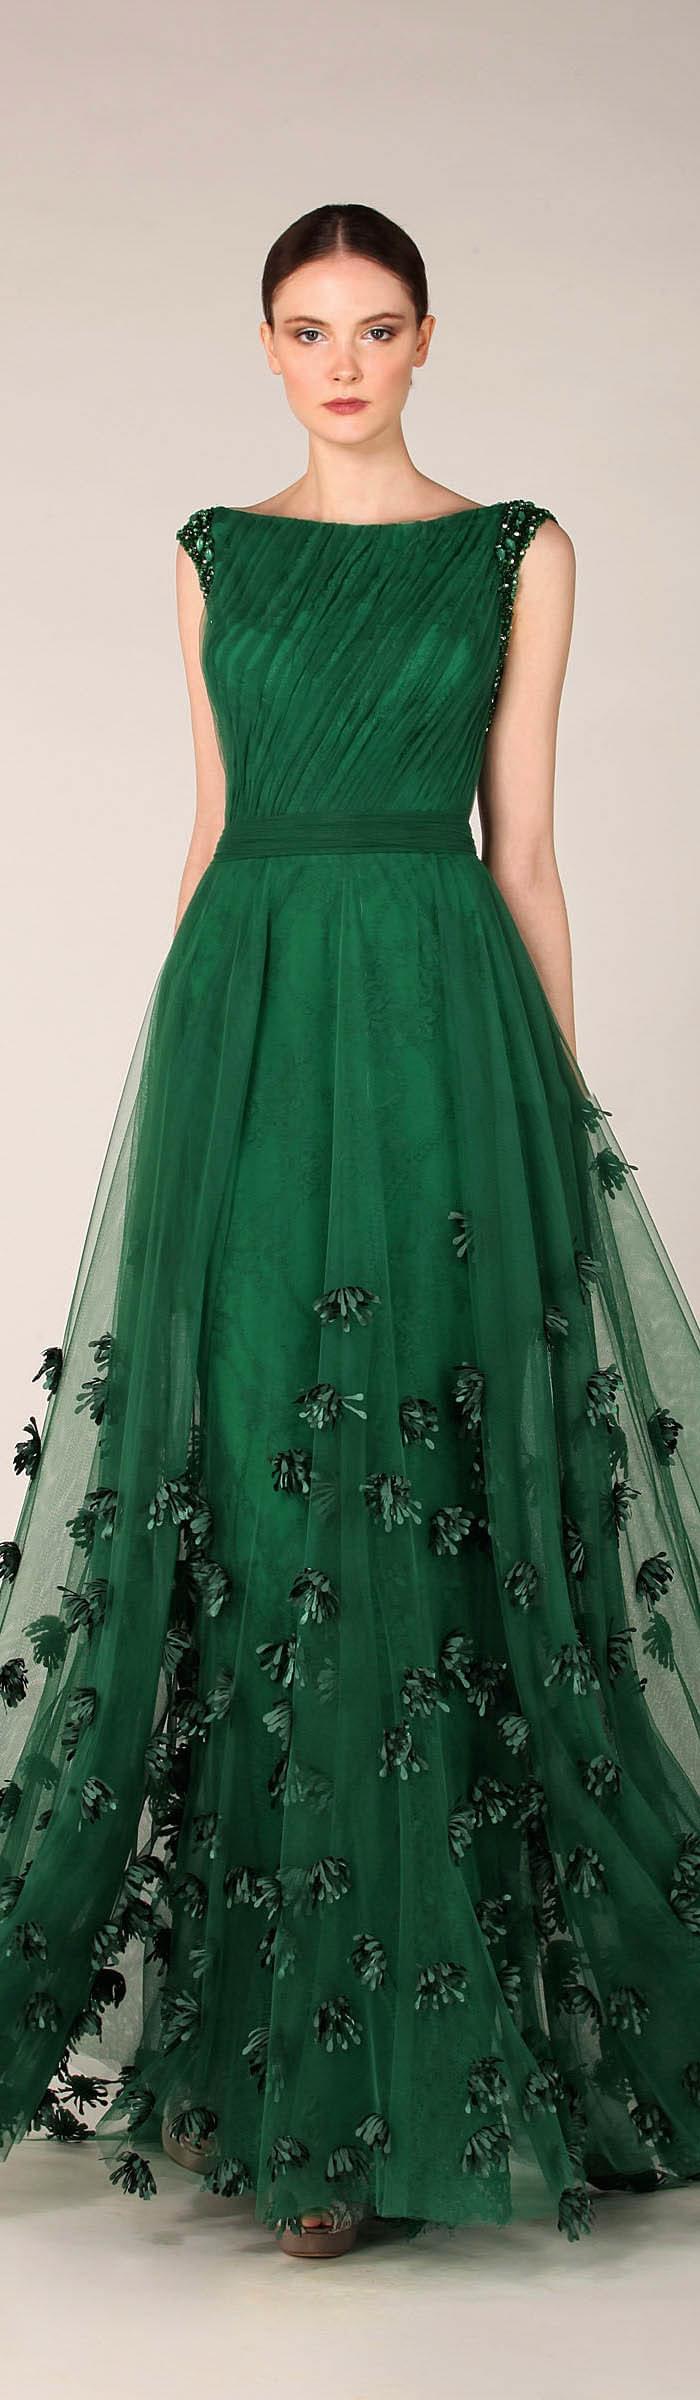 Tony Ward Fall Winter 2013-2014 – Fashion Diva Design